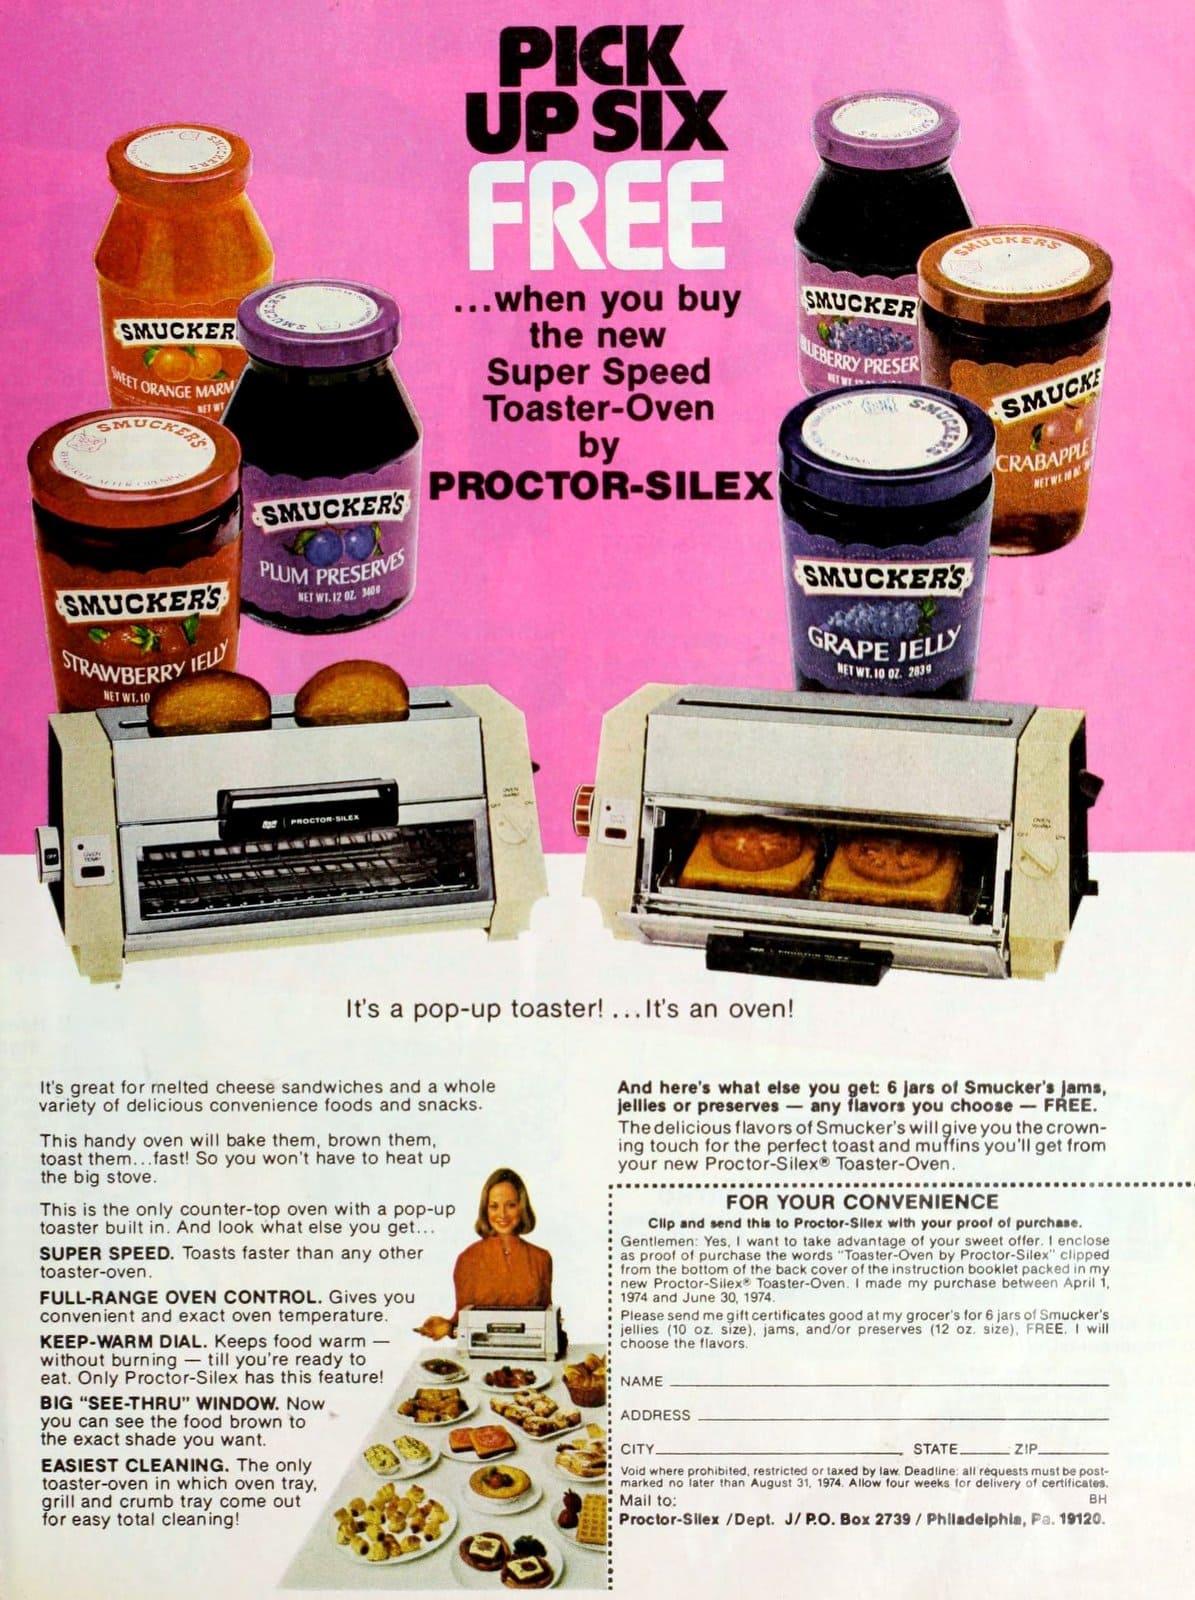 Vintage Proctor-Silex Super Speed toaster ovens (1974)